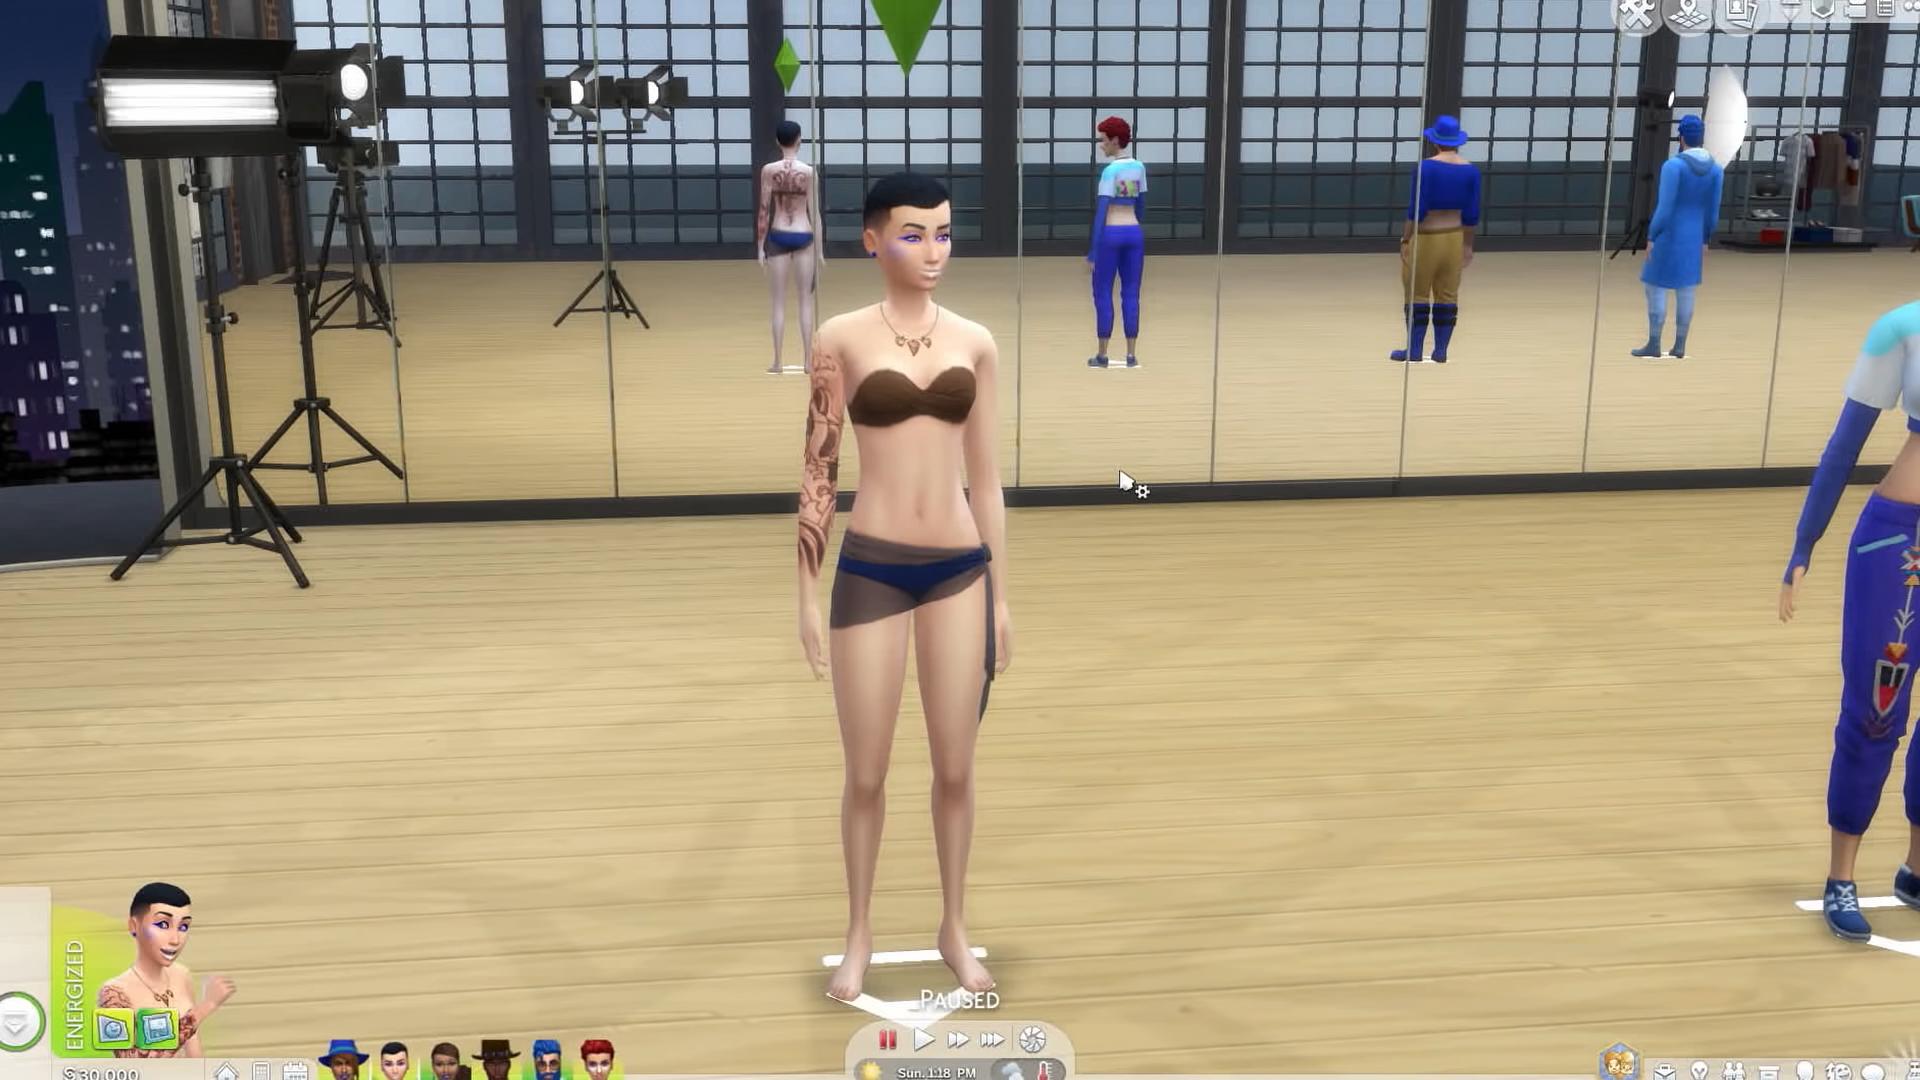 Les Sims Spark'd Screenshot-2020-08-03-173932